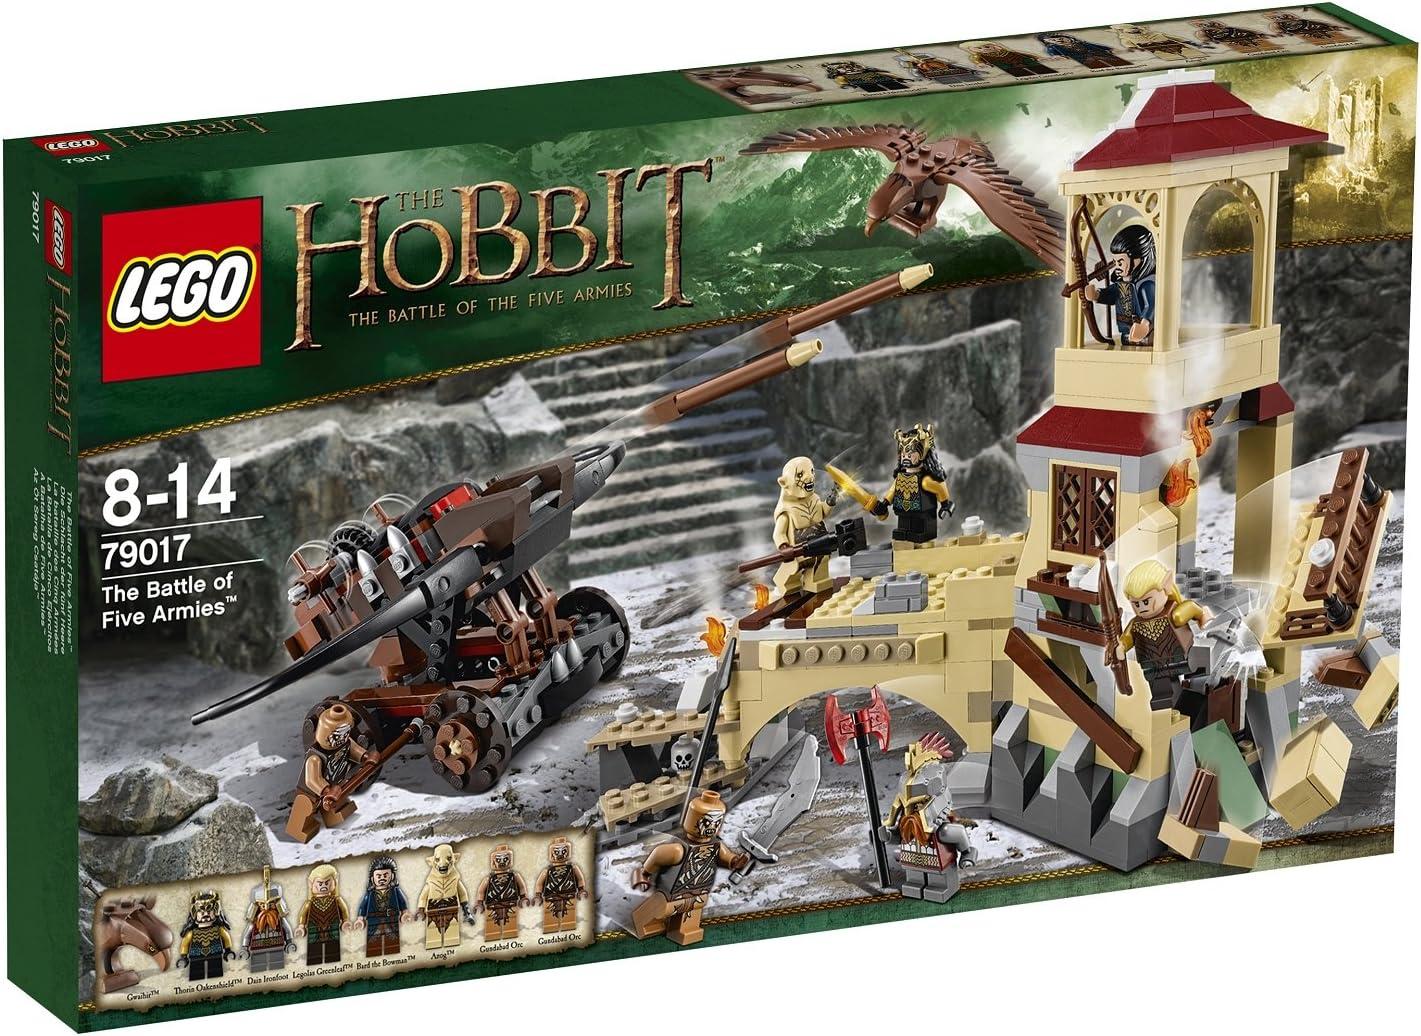 Lego hobbit game guide